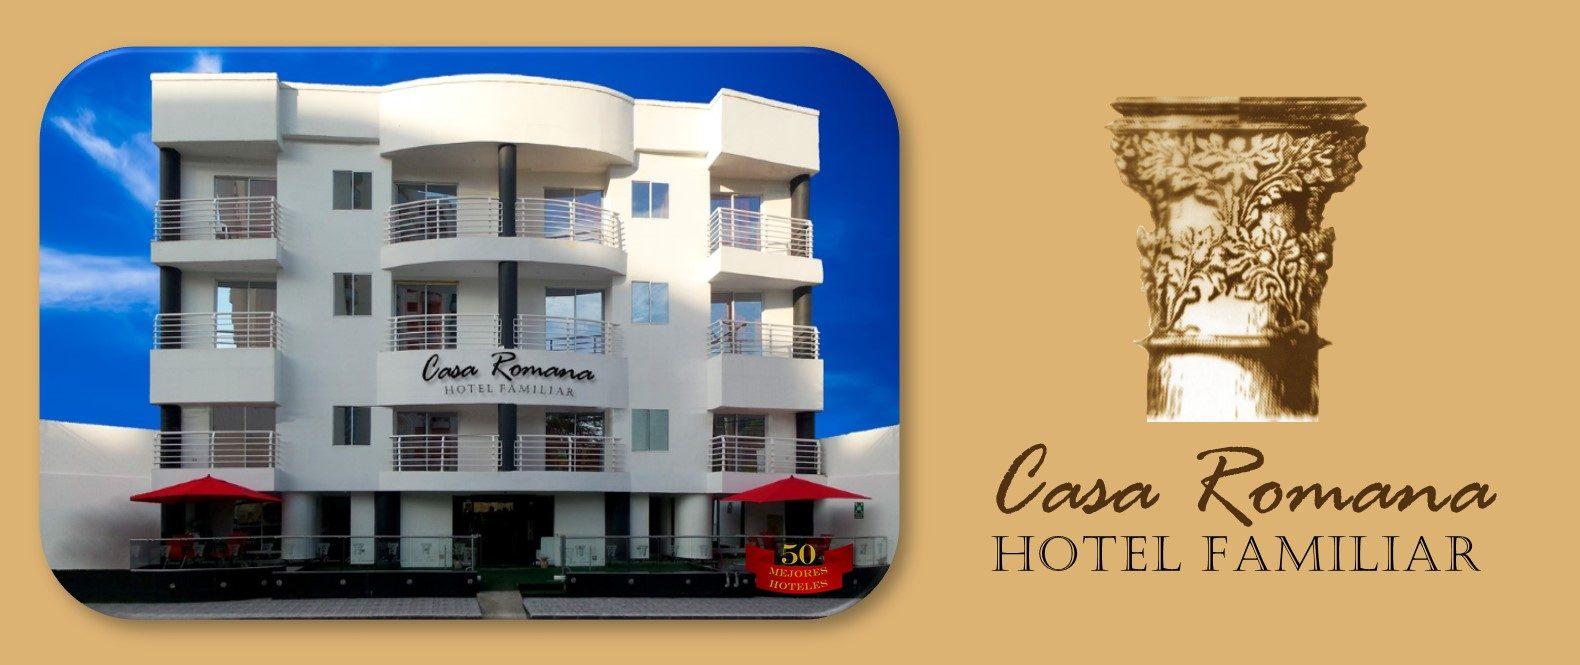 carrusel-hotel-casa-romana-01-1000x666-ok